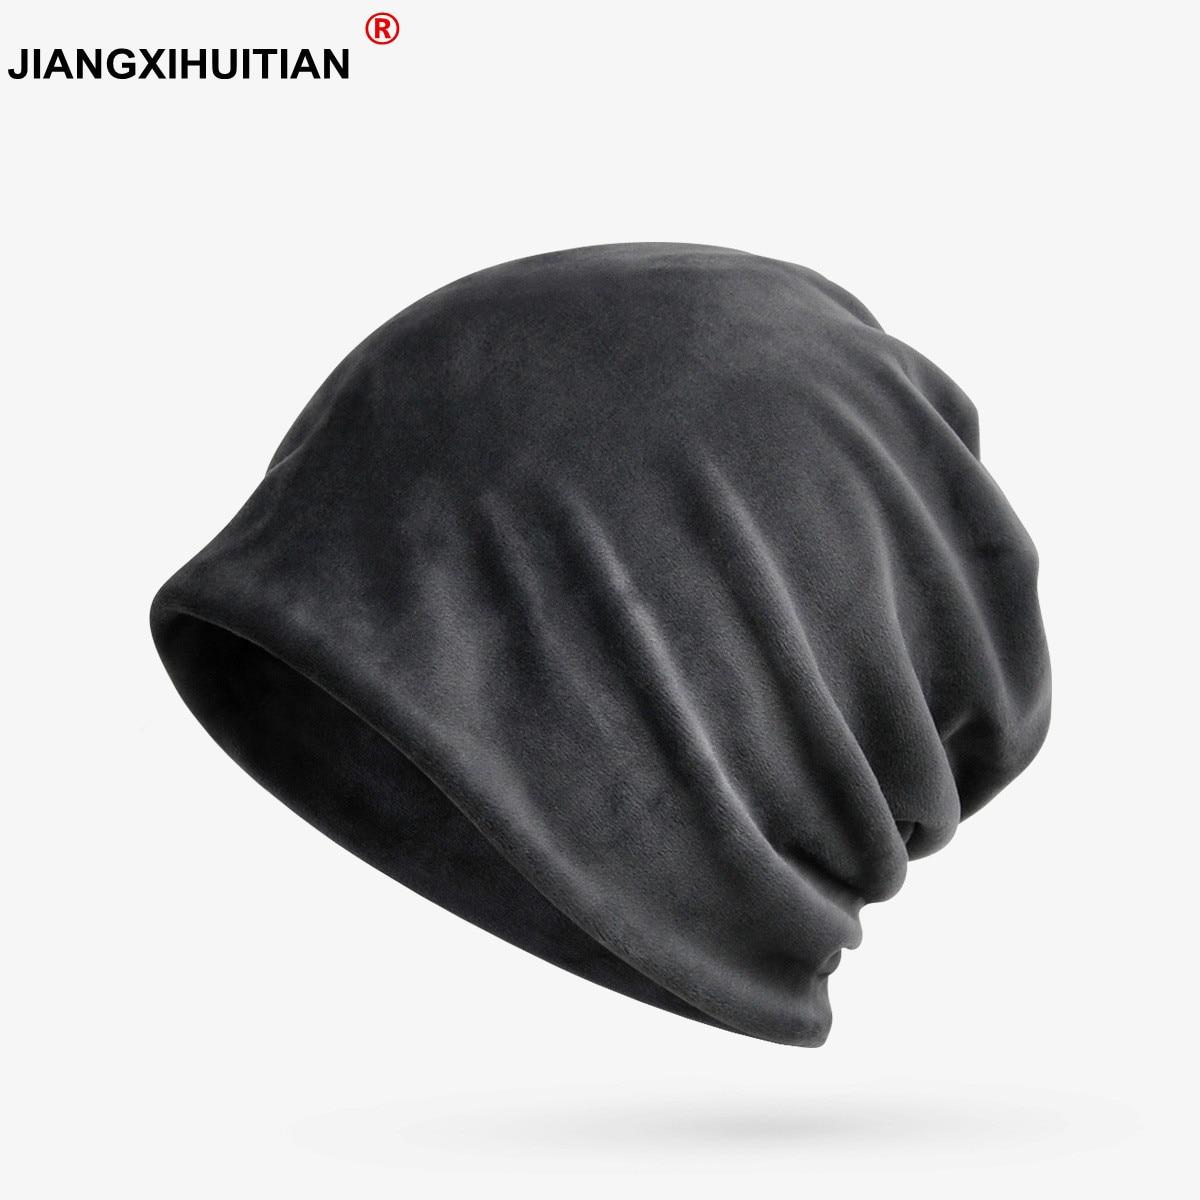 Winter Hats For Women Men Cashmere Turban Hat Ladies Thick Velvet Warm Cap Outdoor Ski Hat Female Mens'   Skullies     Beanies